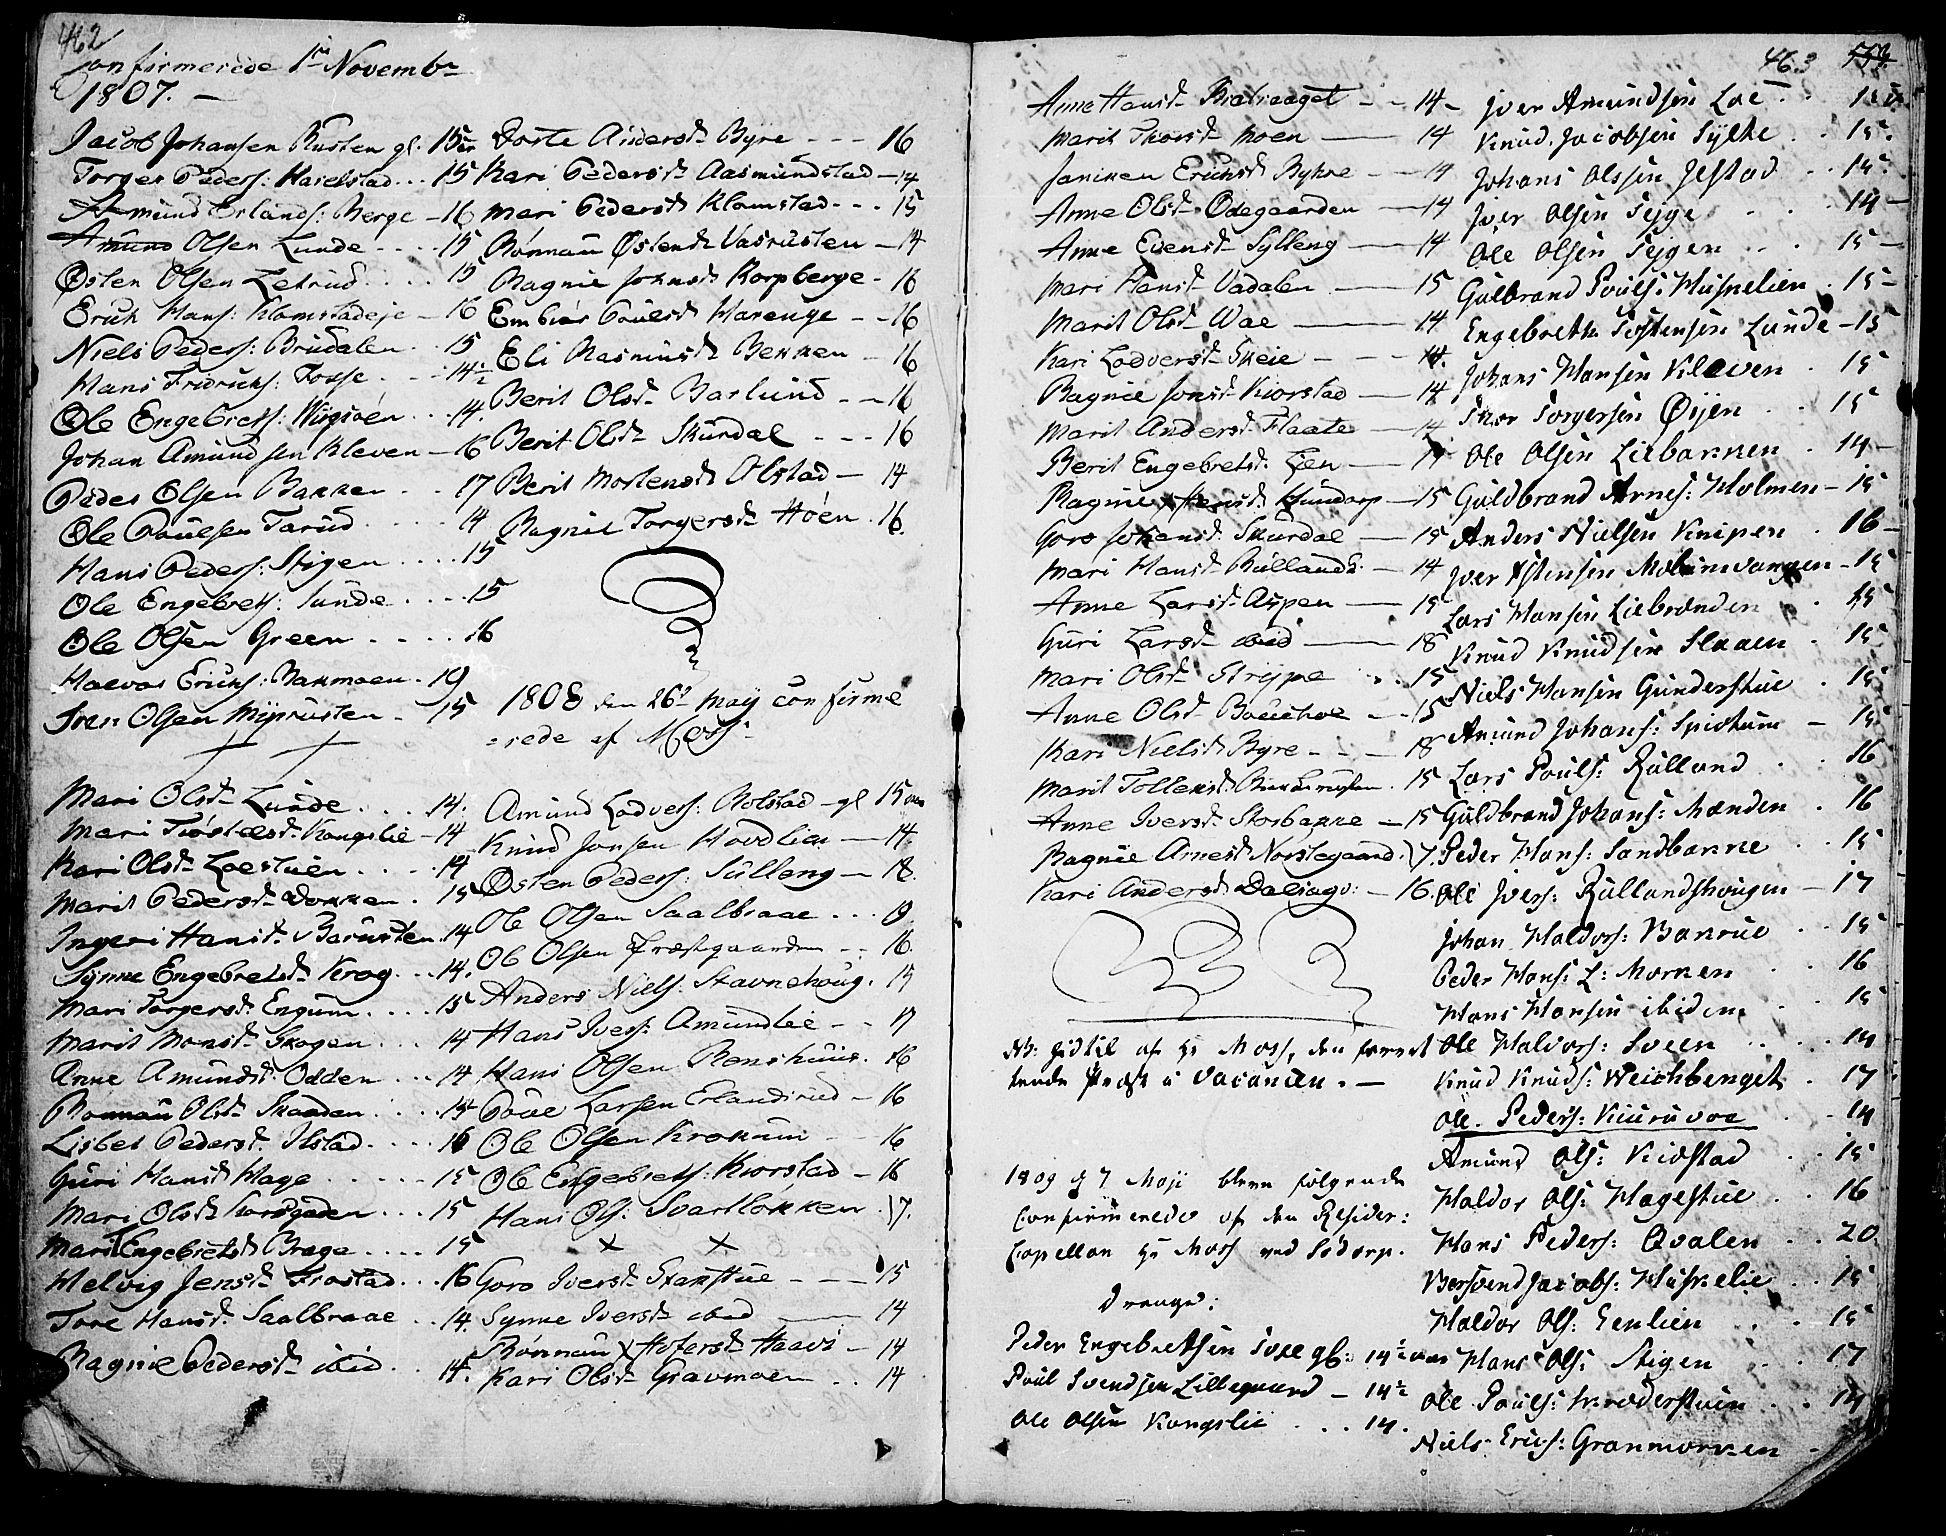 SAH, Fron prestekontor, H/Ha/Haa/L0001: Ministerialbok nr. 1, 1799-1816, s. 462-463